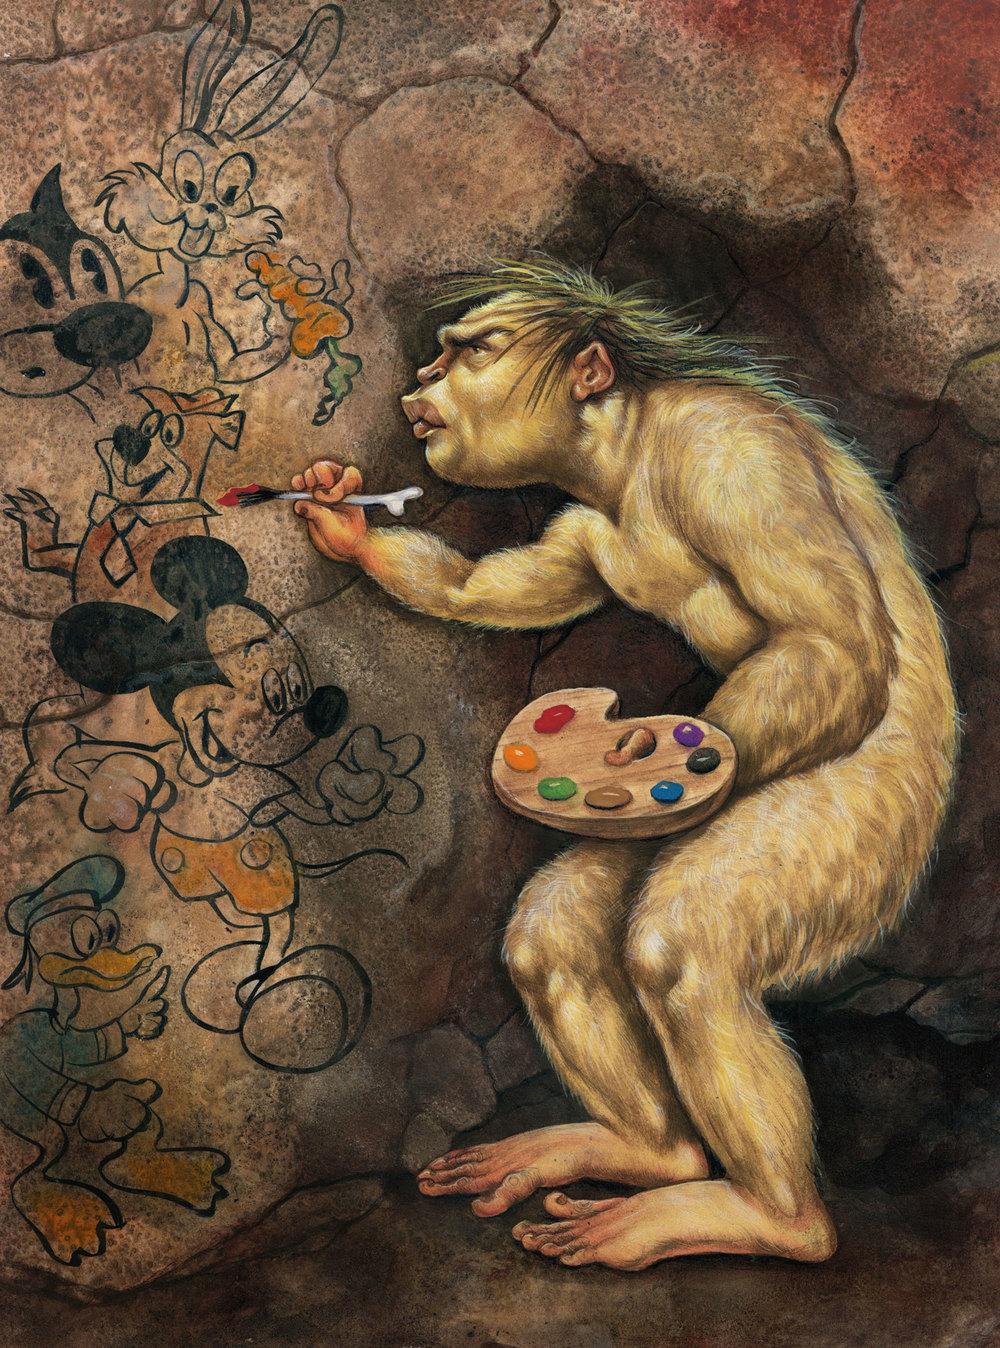 Anita Kunz, Mondo Neanderthal, 2008, $1,800